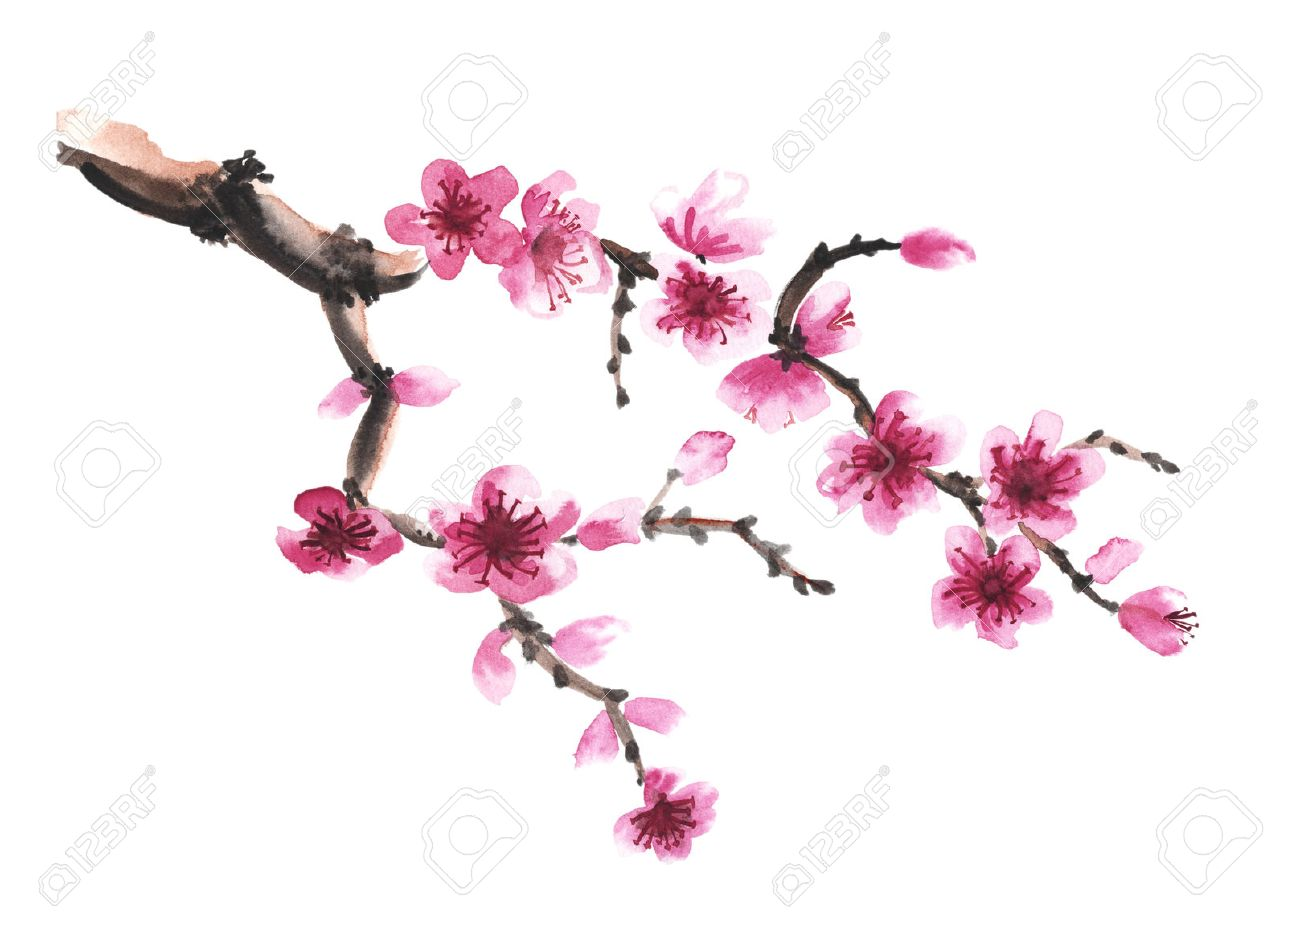 Branche Aquarelle Dessinee A La Main De Sakura Isole Sur Blanc